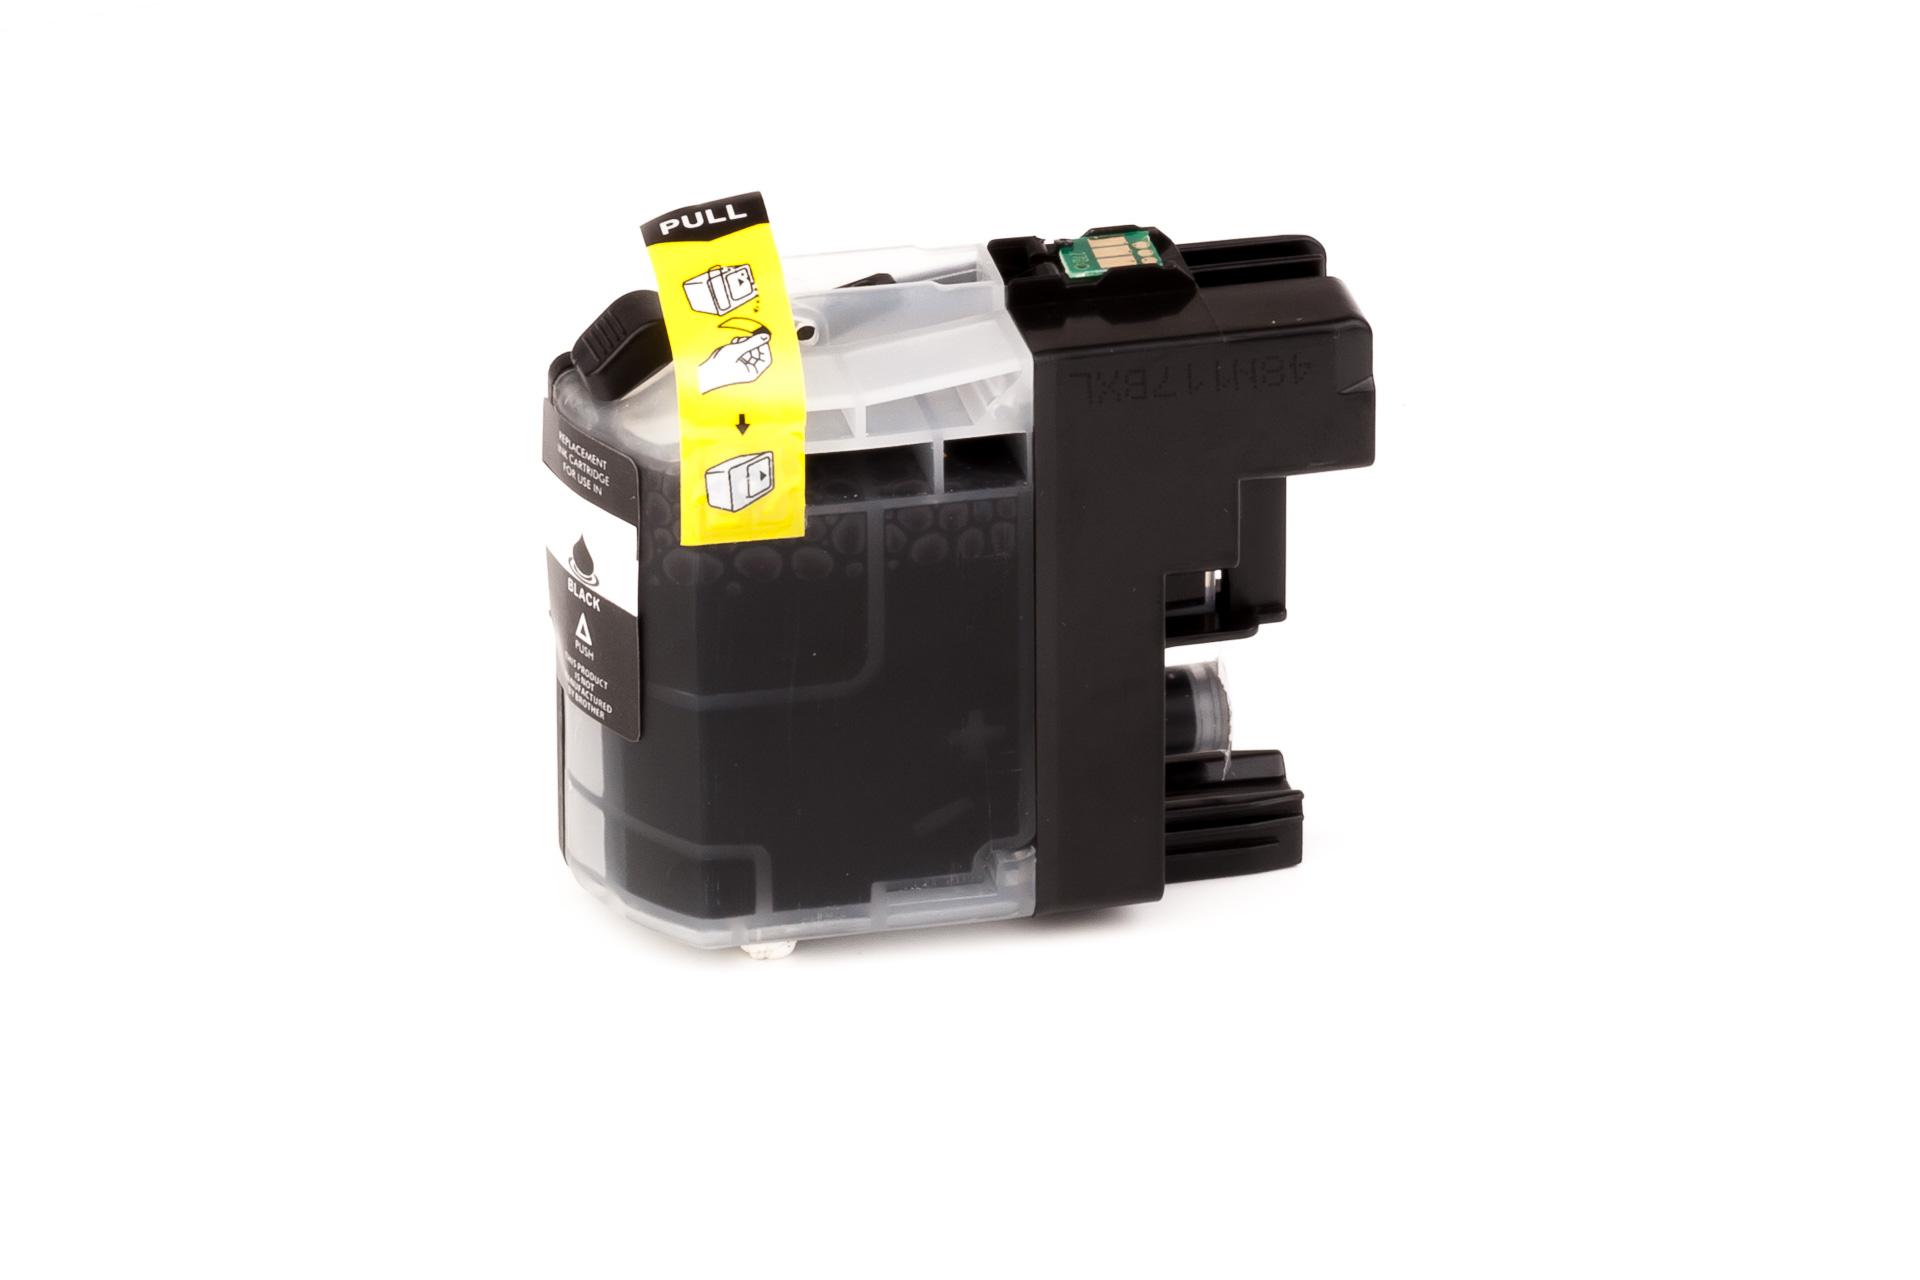 ASC-Premium-Tintenpatrone für Brother MFC-J 4410 DW schwarz MFC-J 4410 DW MFC-J4410DW